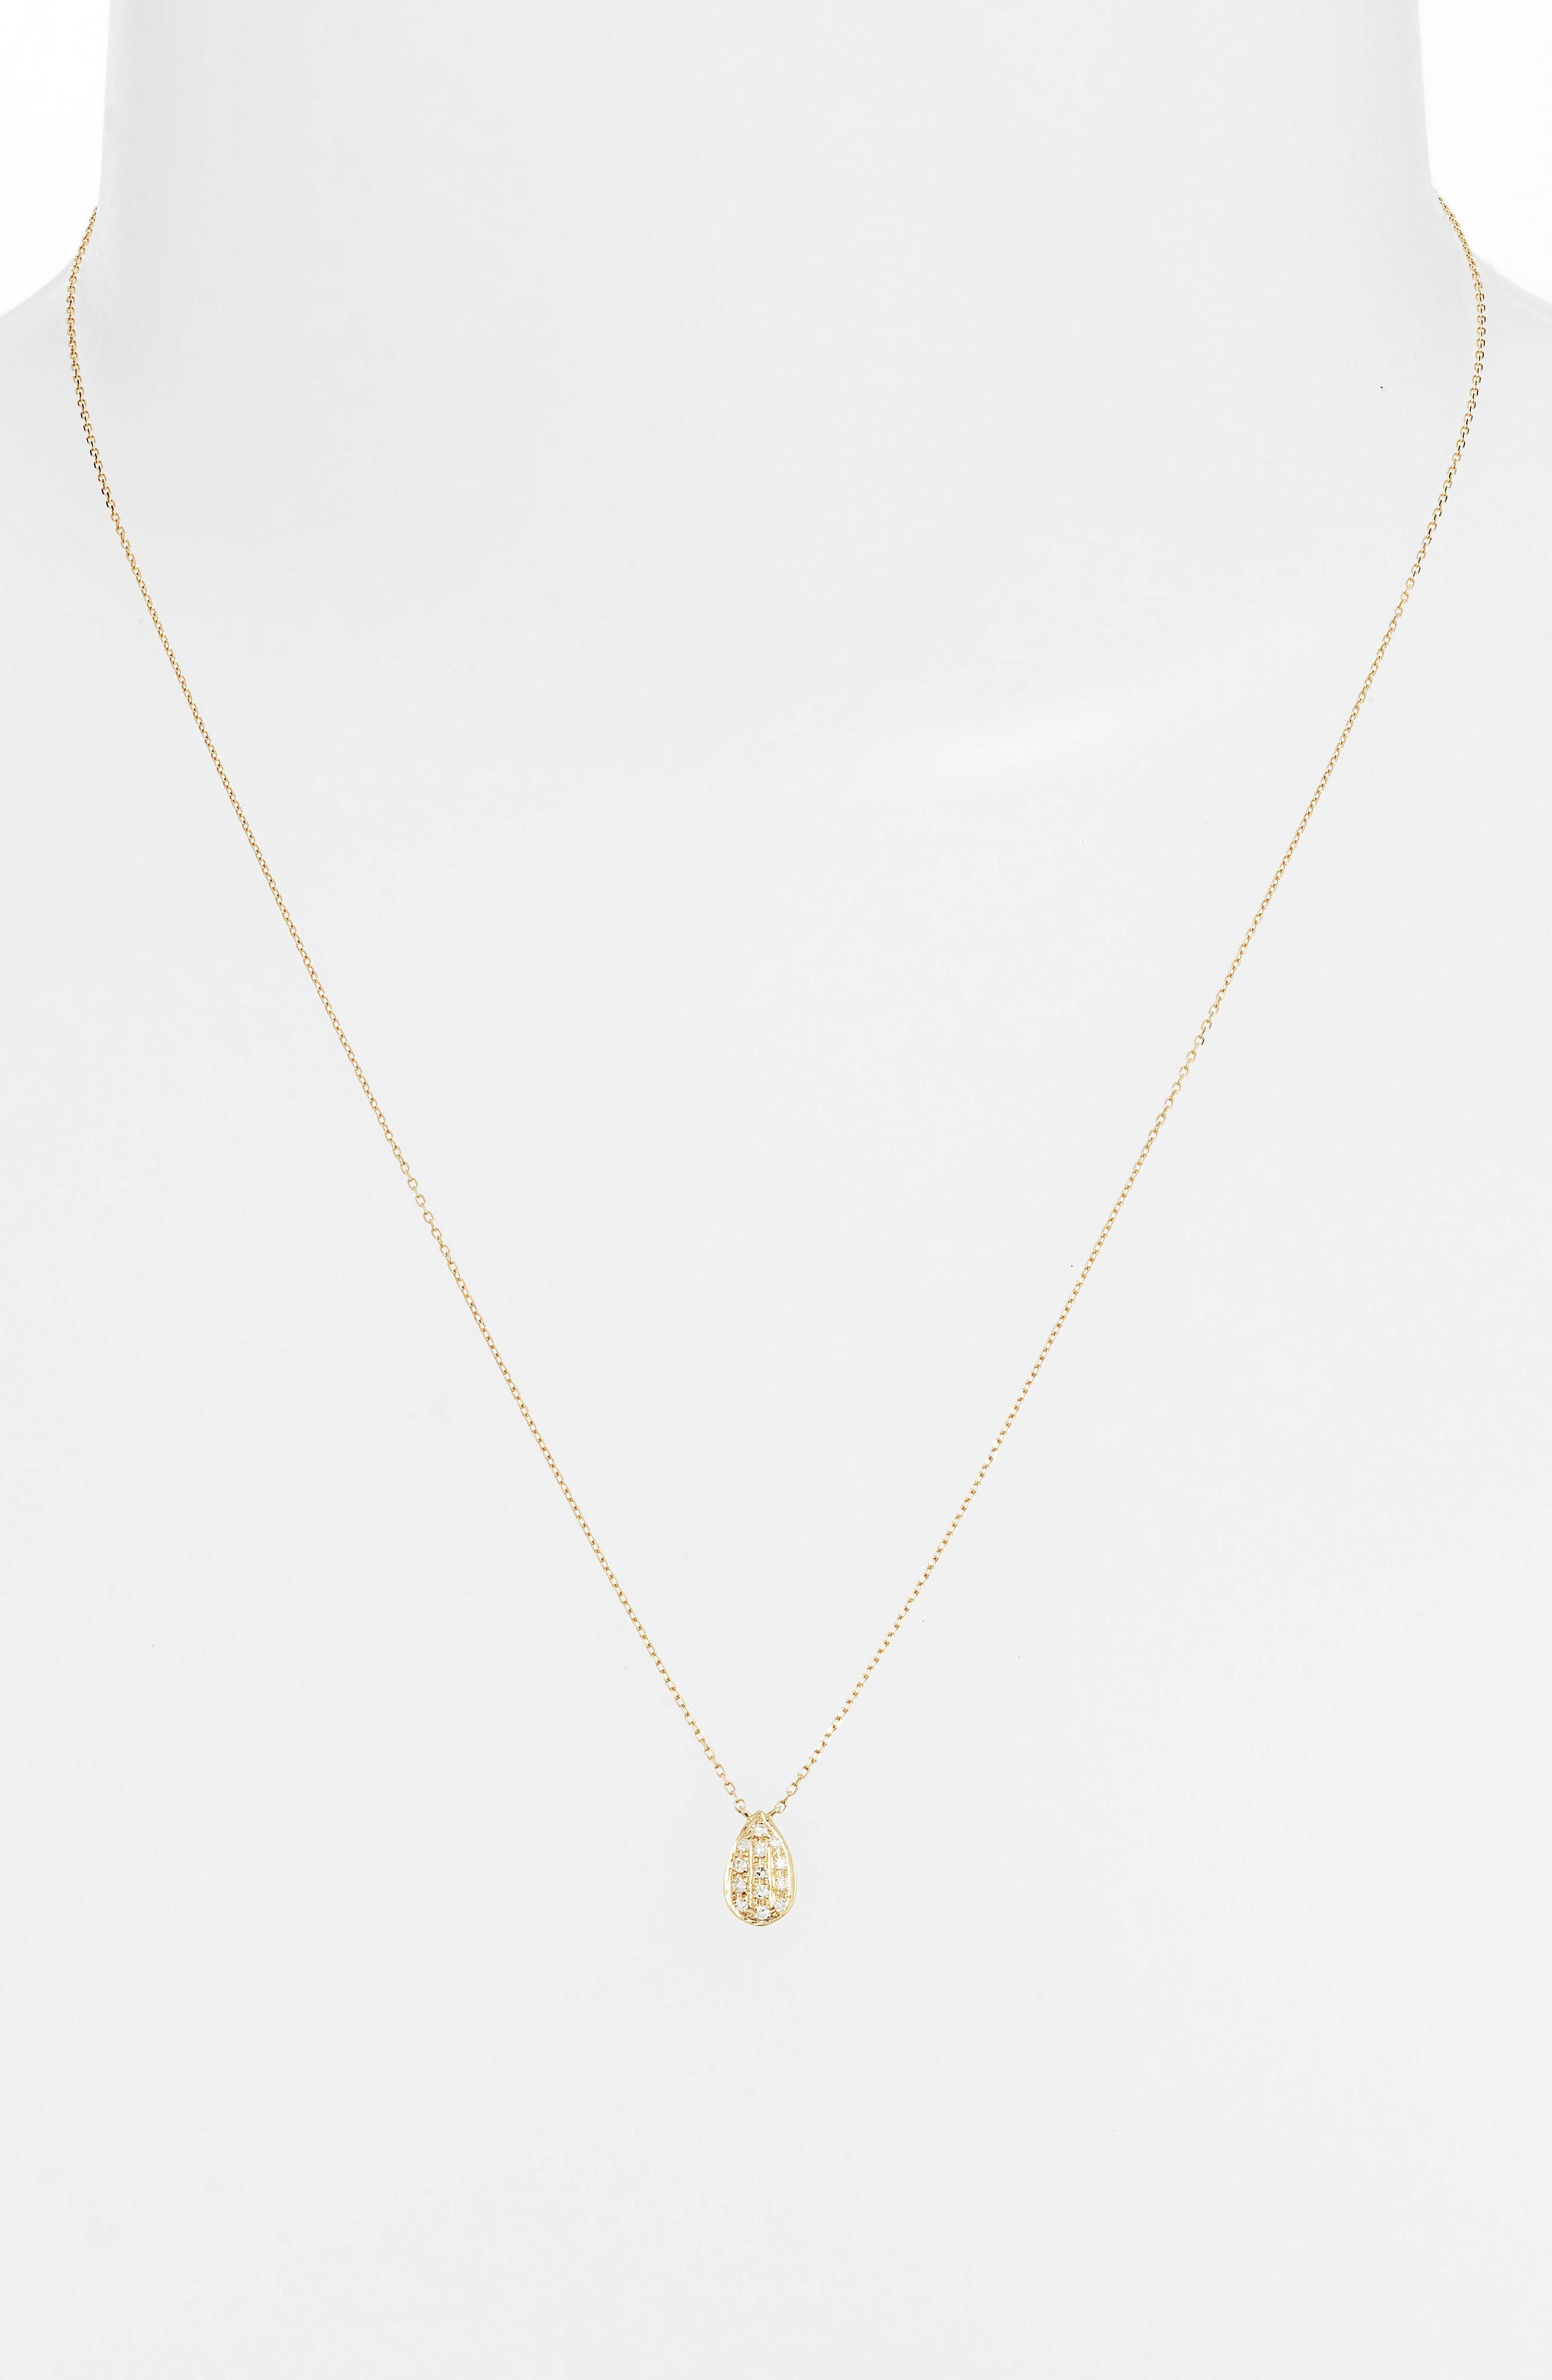 DANA REBECCA DESIGNS, Samantha Lynn Diamond Pendant Necklace, Alternate thumbnail 2, color, 710